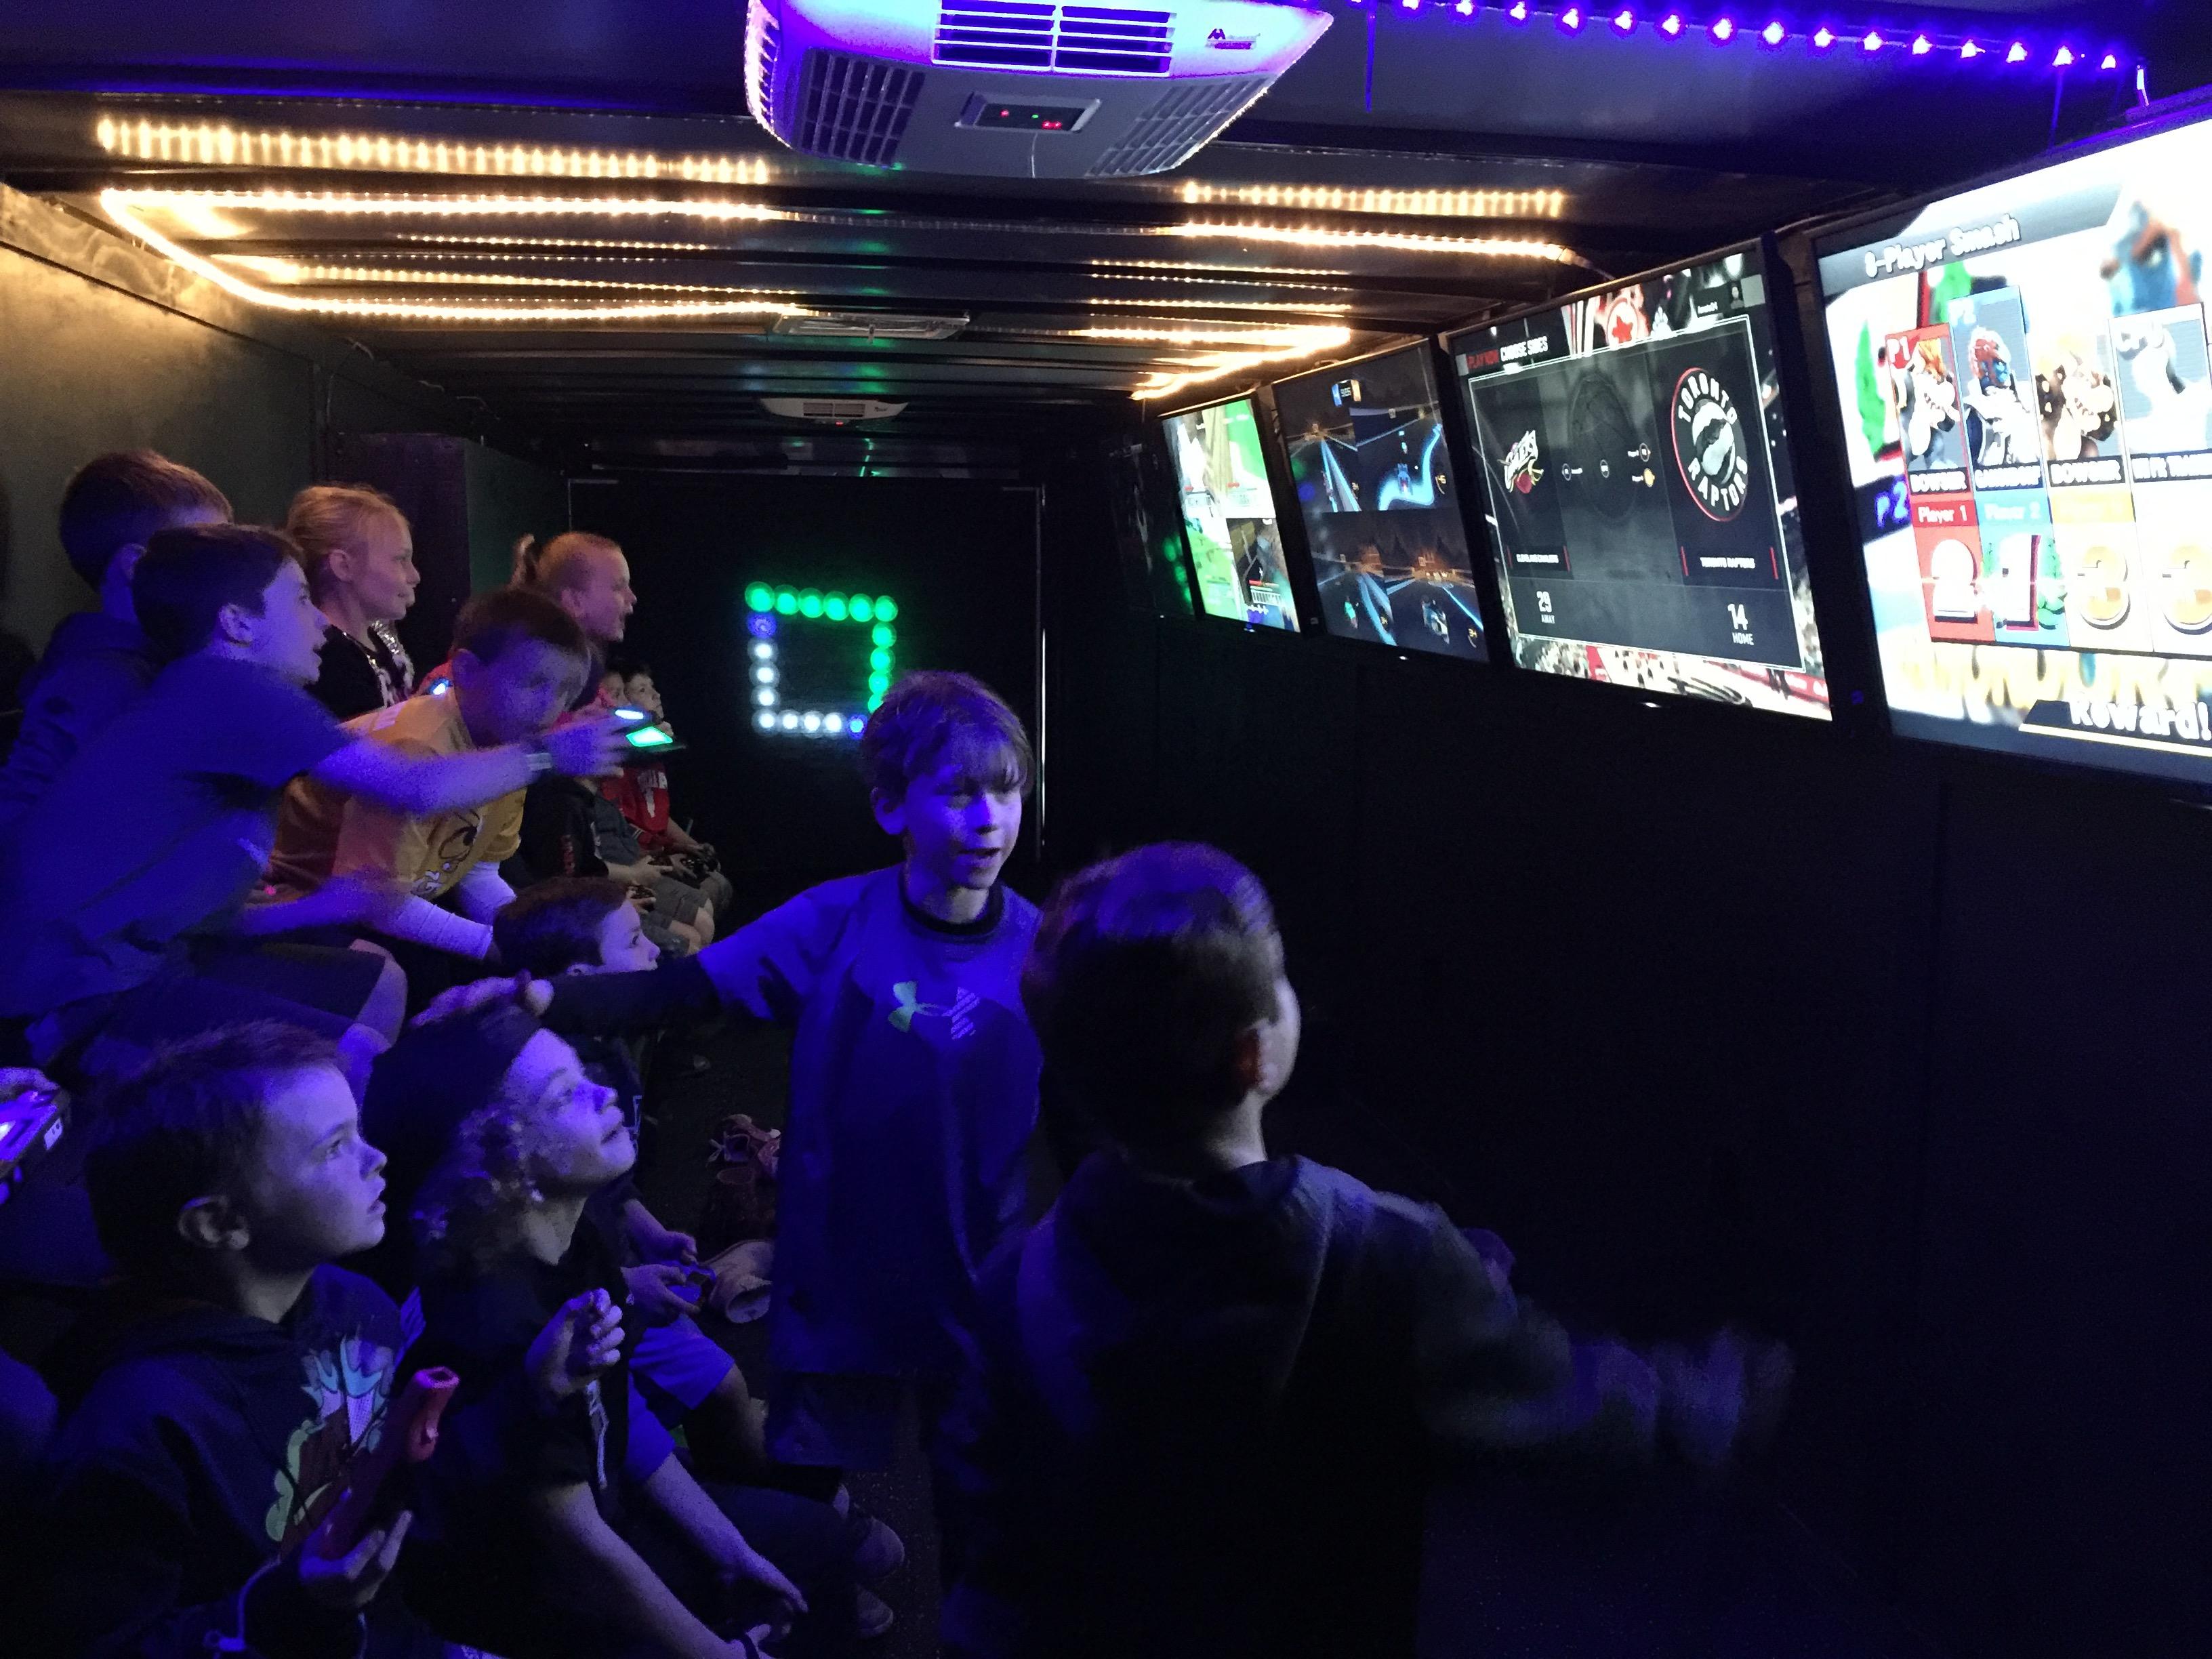 Party Trailer Inside Dark